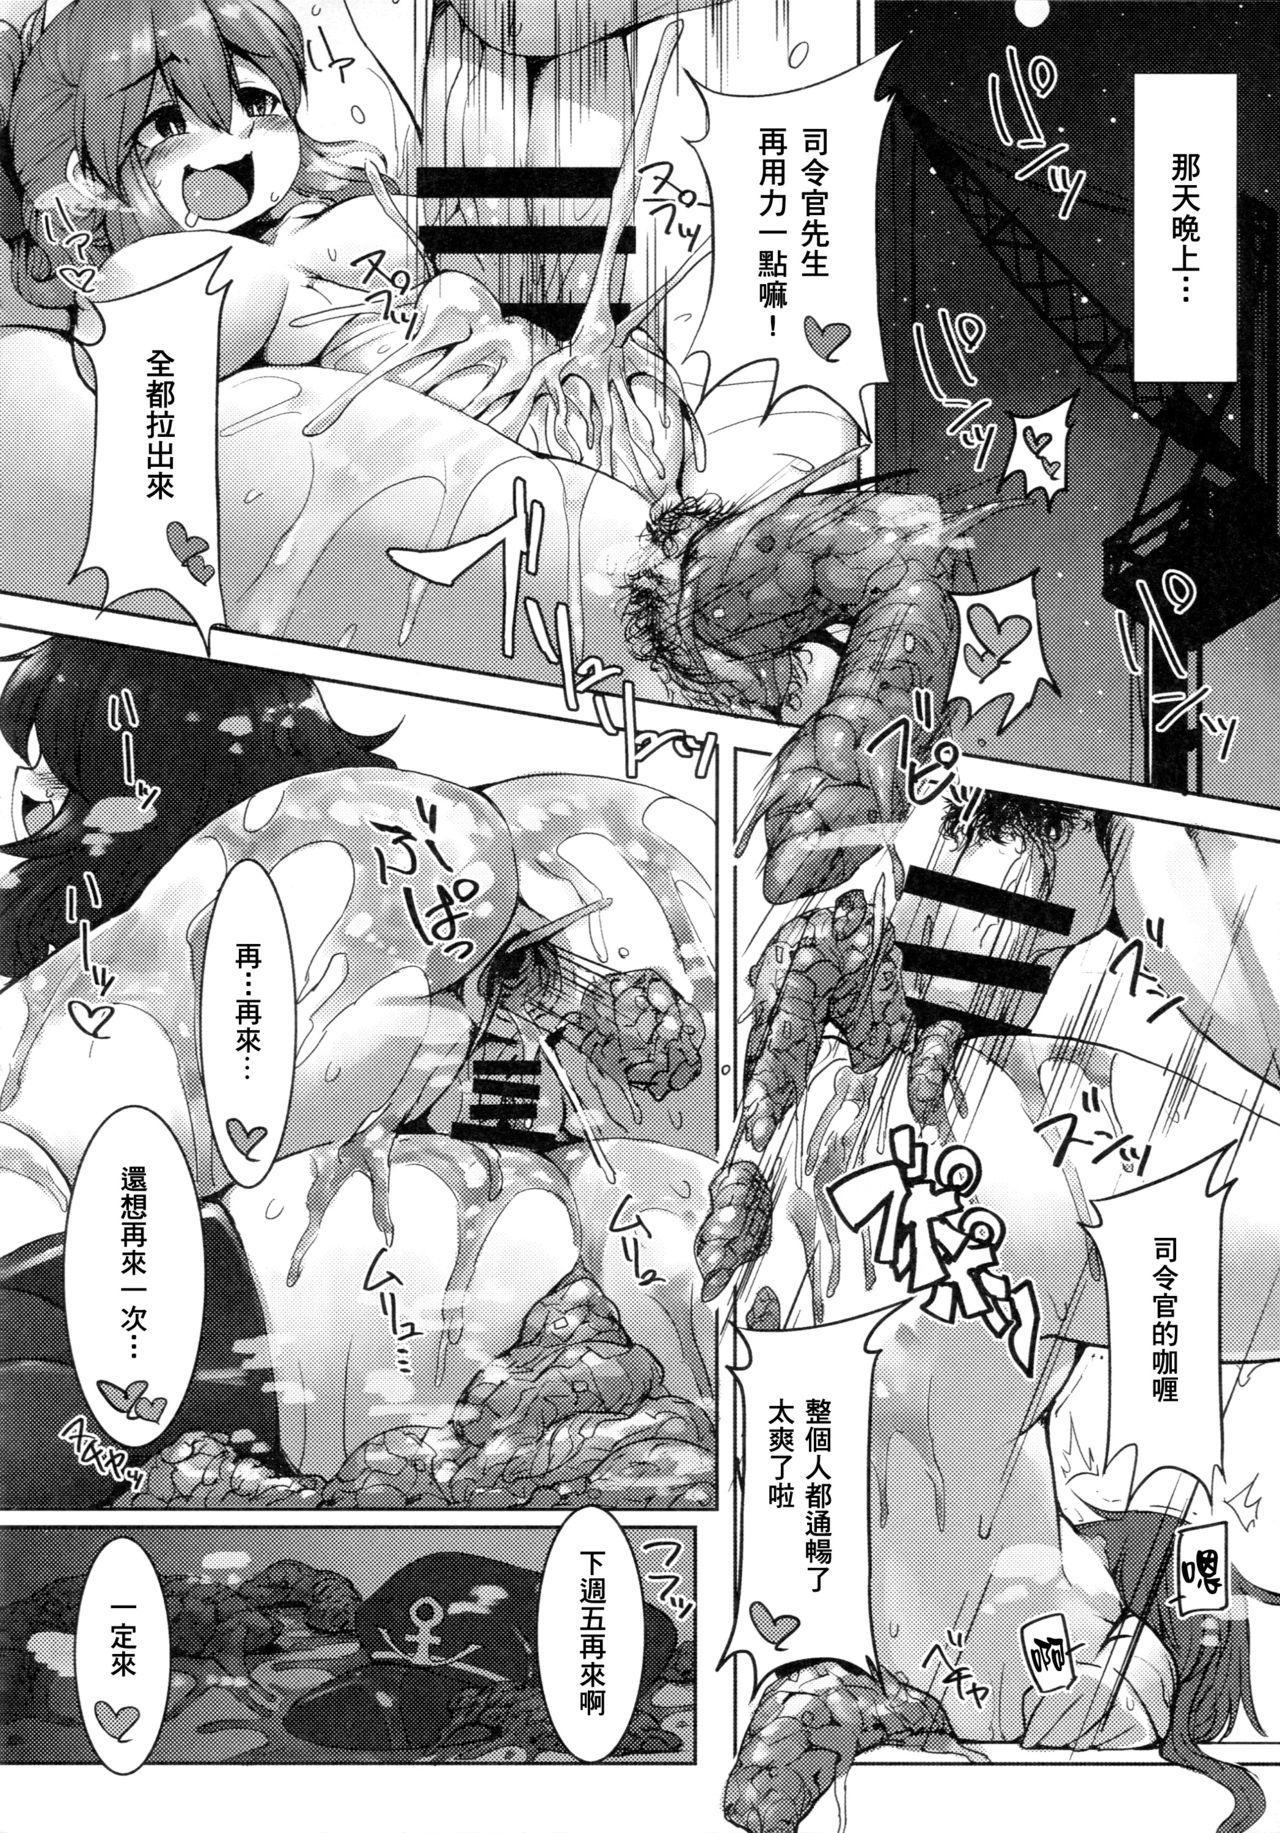 KanColle Haisetsu Sex Goudoushi LoveSca! Goudou Enshuu!! | 艦C排泄性交合同誌 激情糞便! 聯合演習!! 75